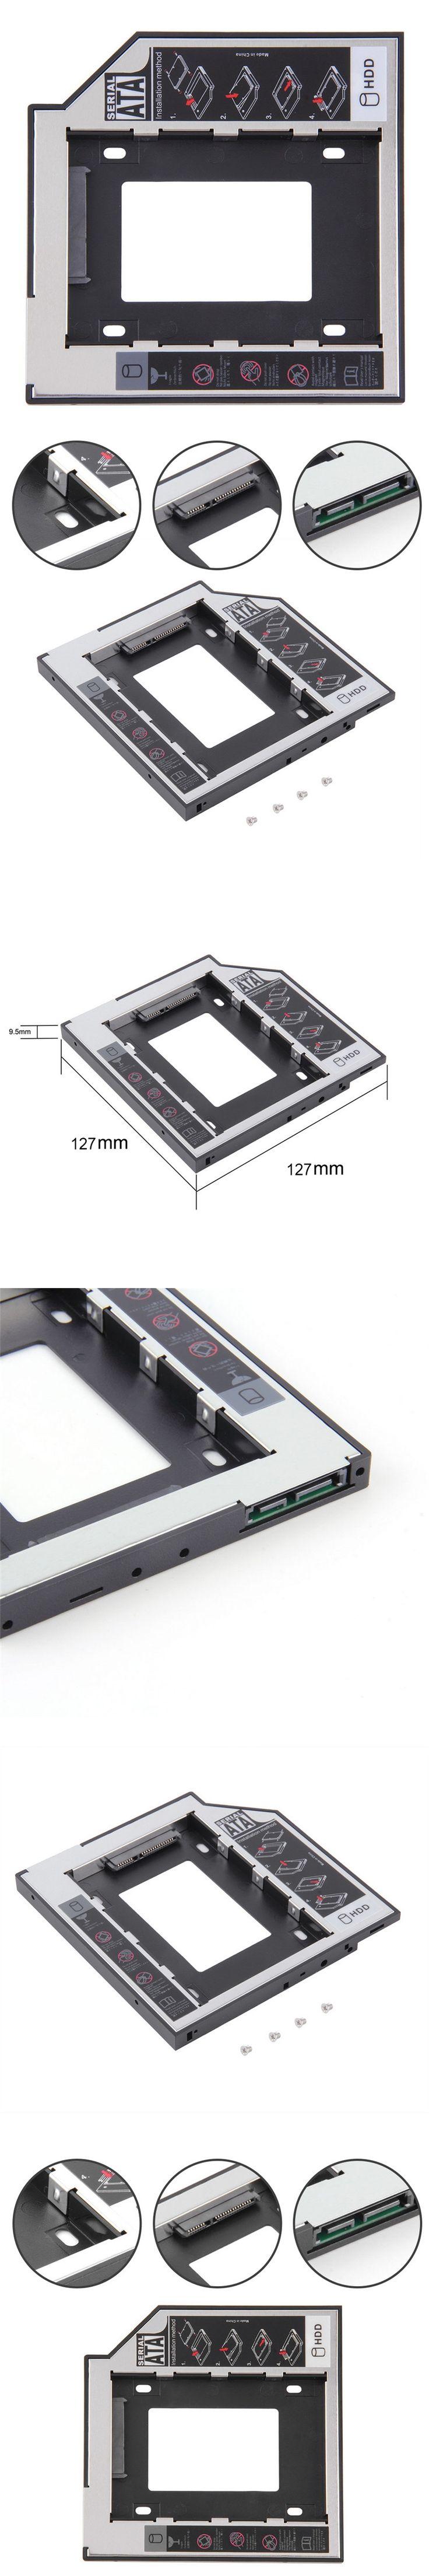 Comfortable Datasheet Webcam Pavilion Dv7 Pin 5v Pictures ...